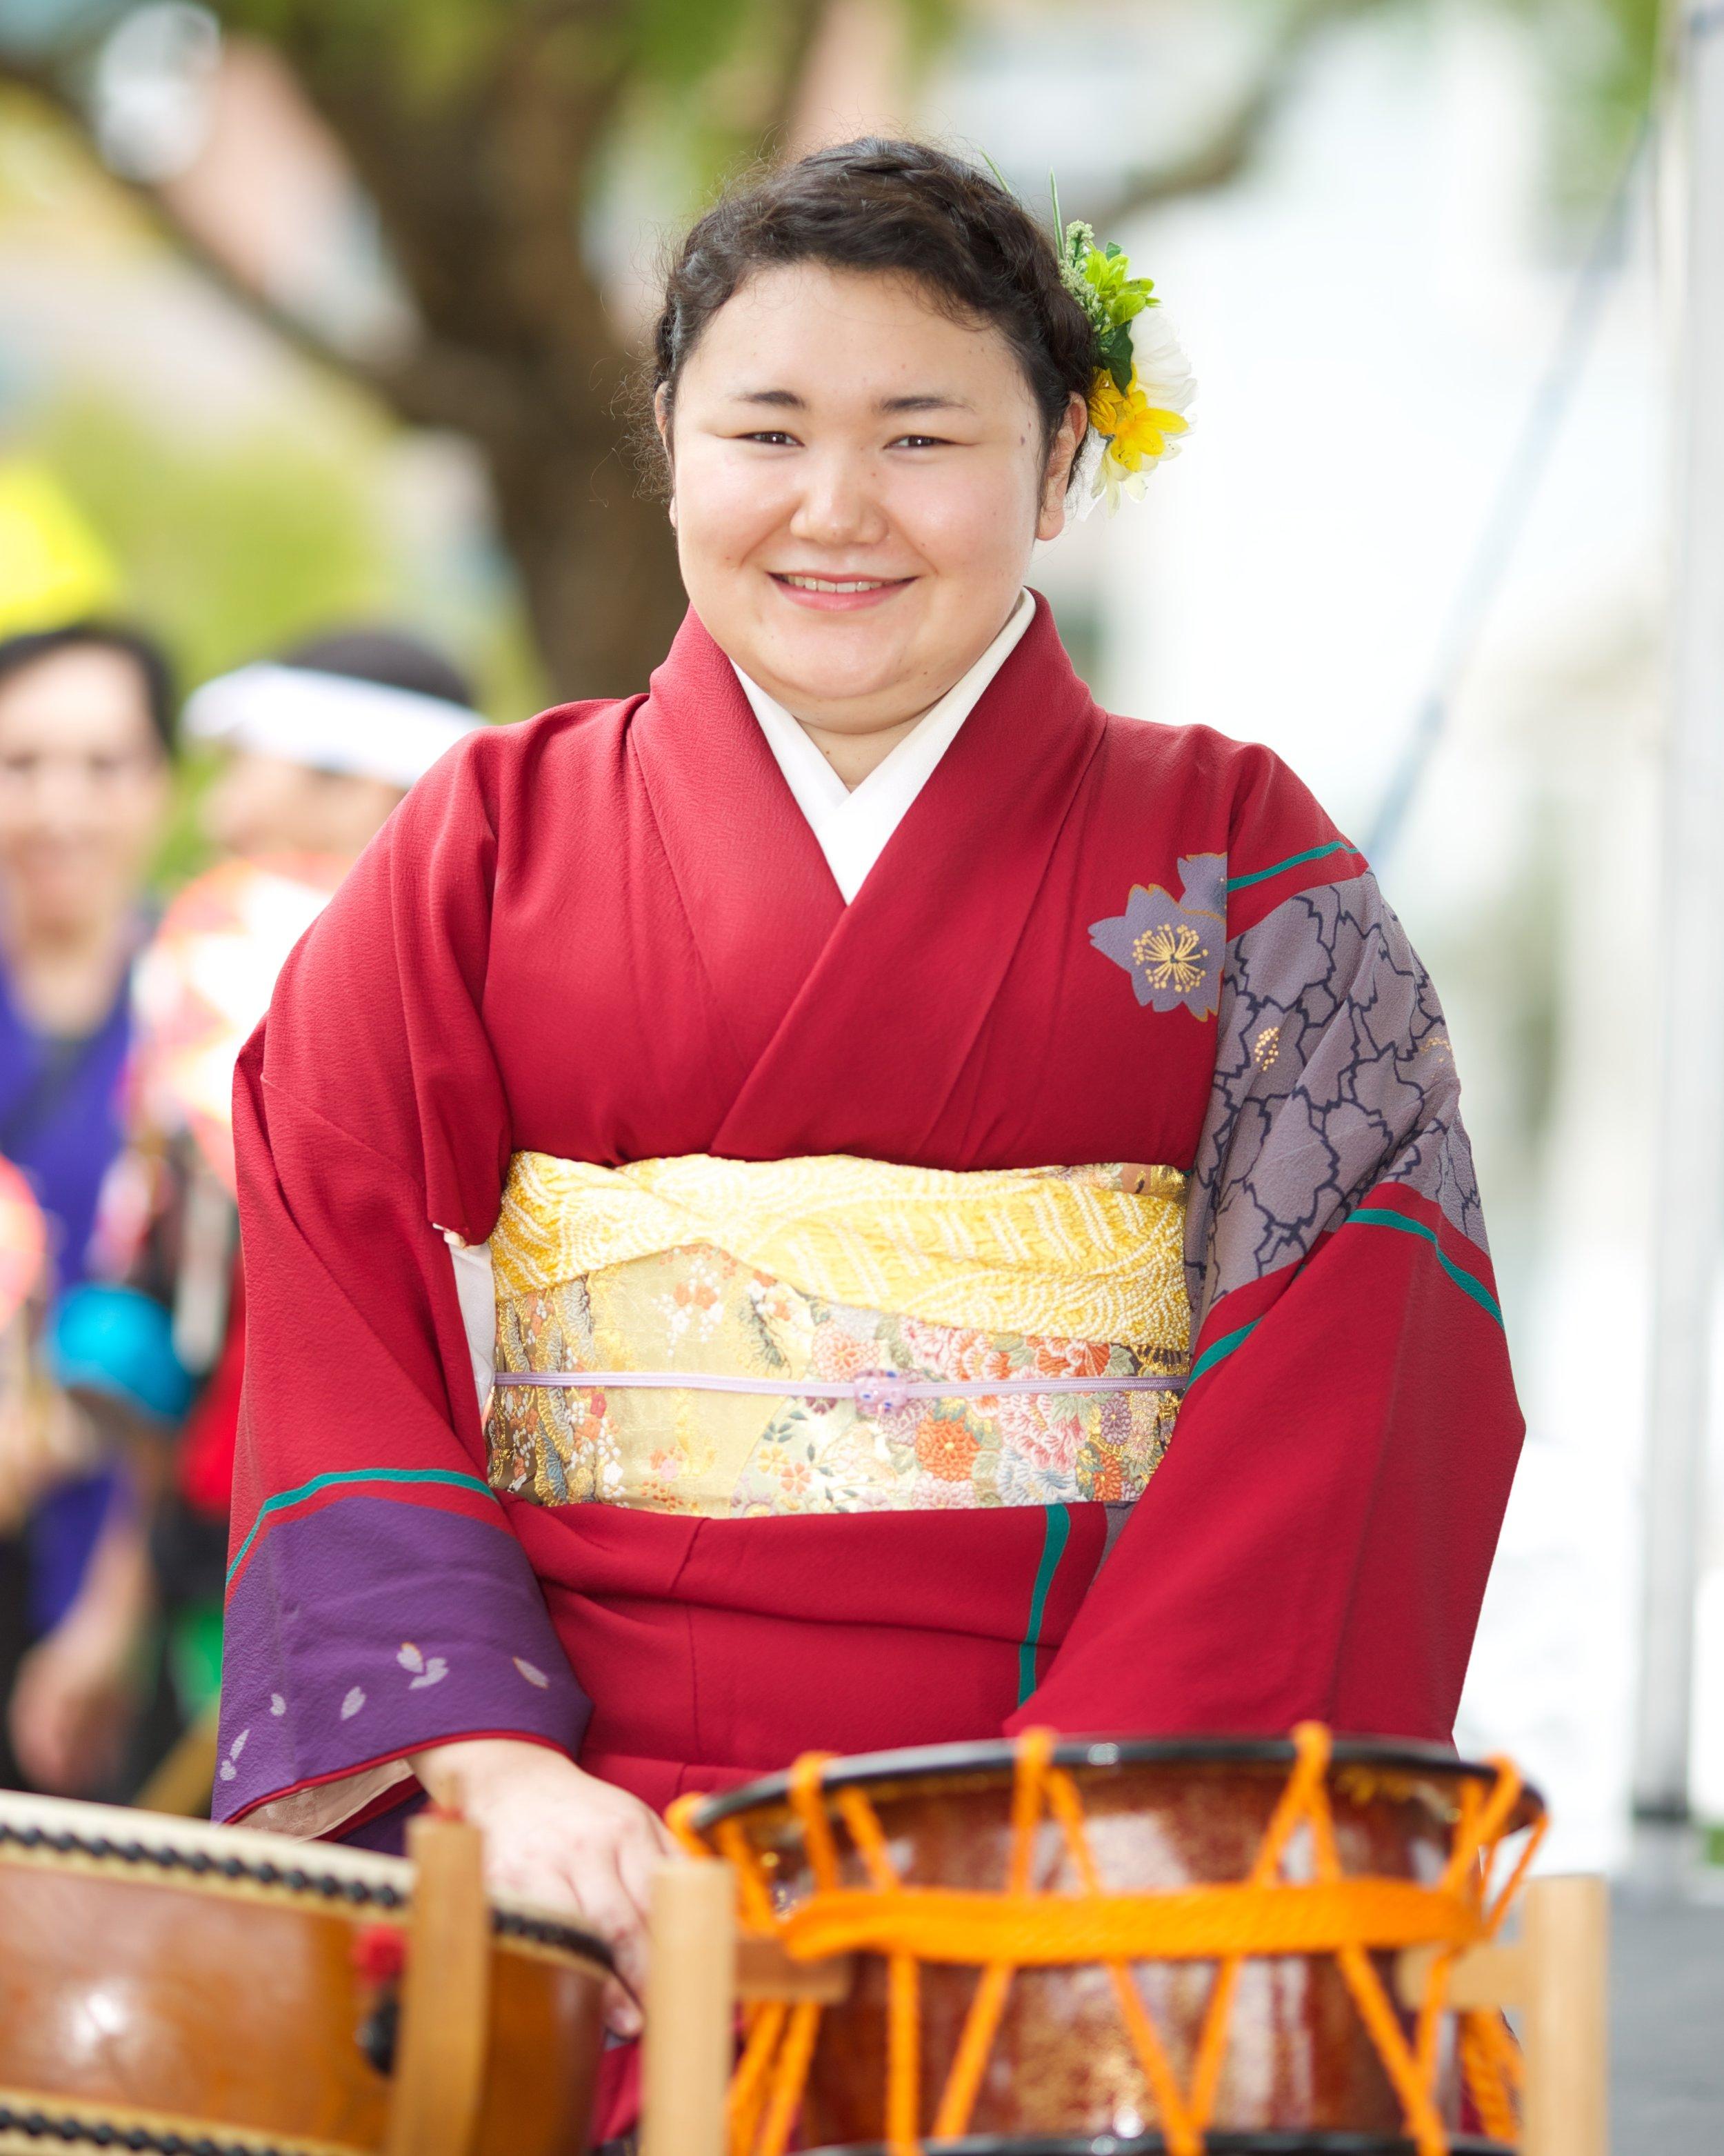 momo---matsutoyo-kai---japanese-cultural-fair-of-santa-cruz-2015_19589786772_o.jpg